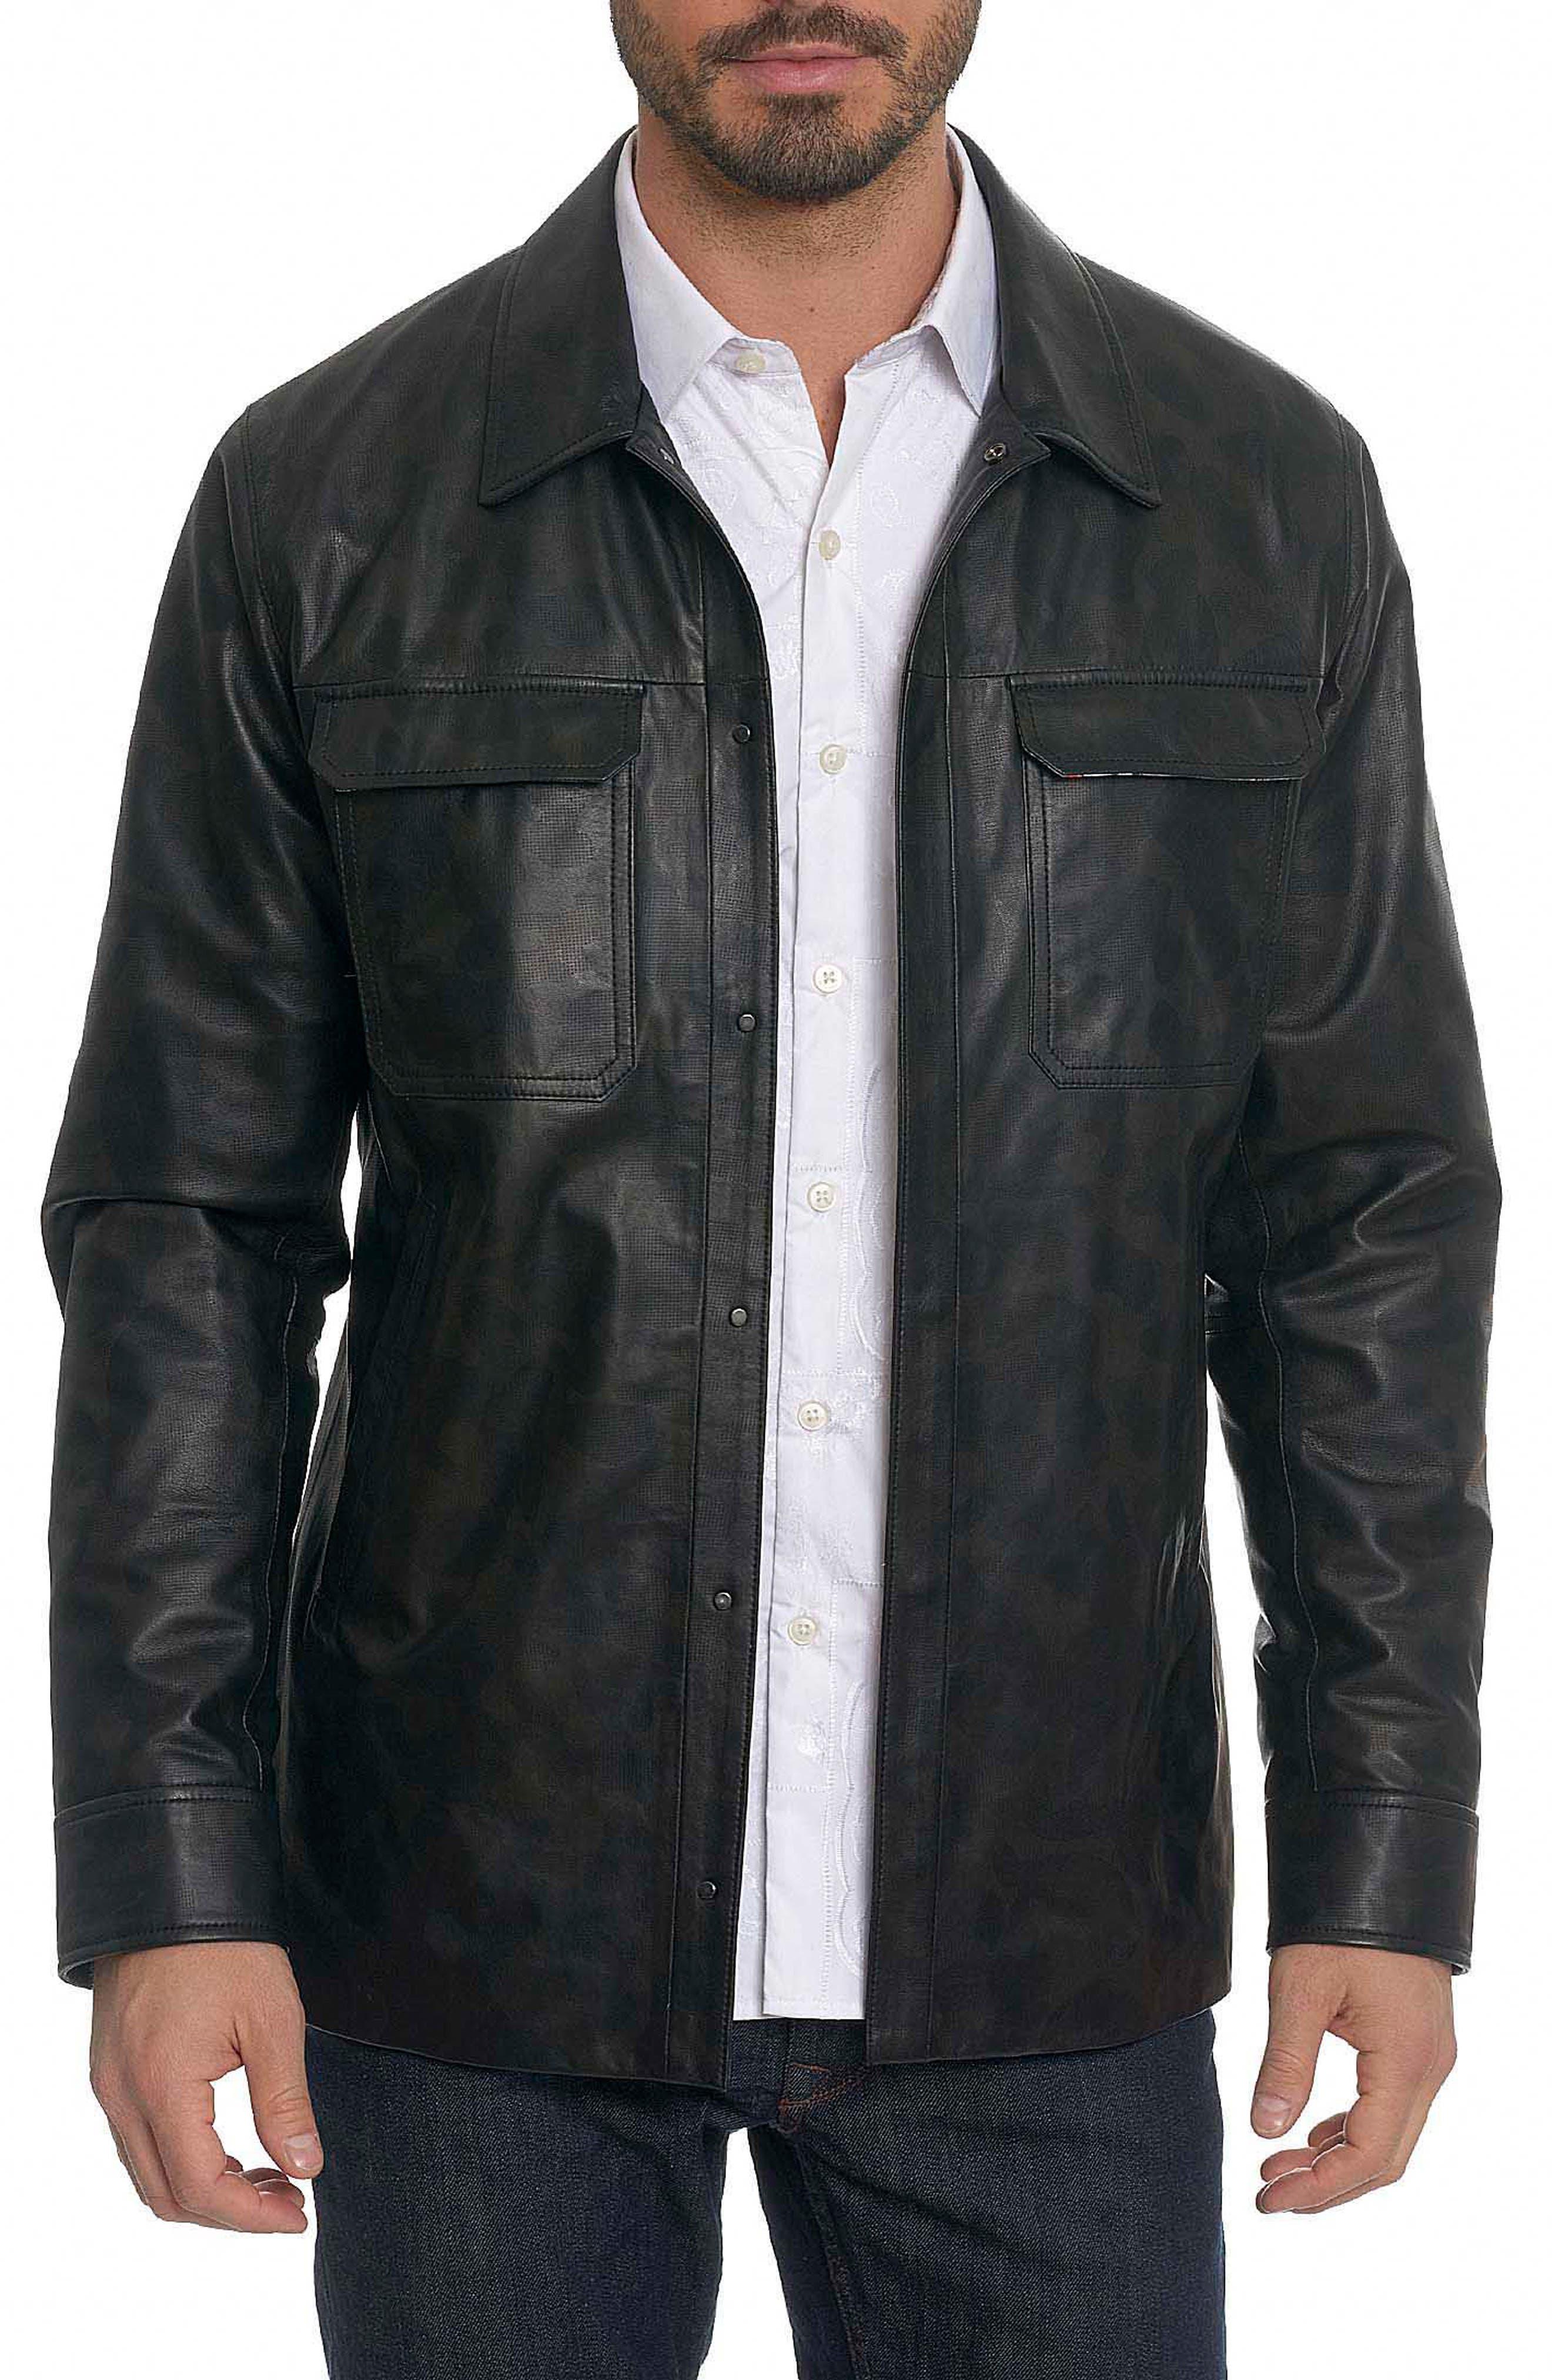 Colden Camo Leather Shirt Jacket,                         Main,                         color, 001